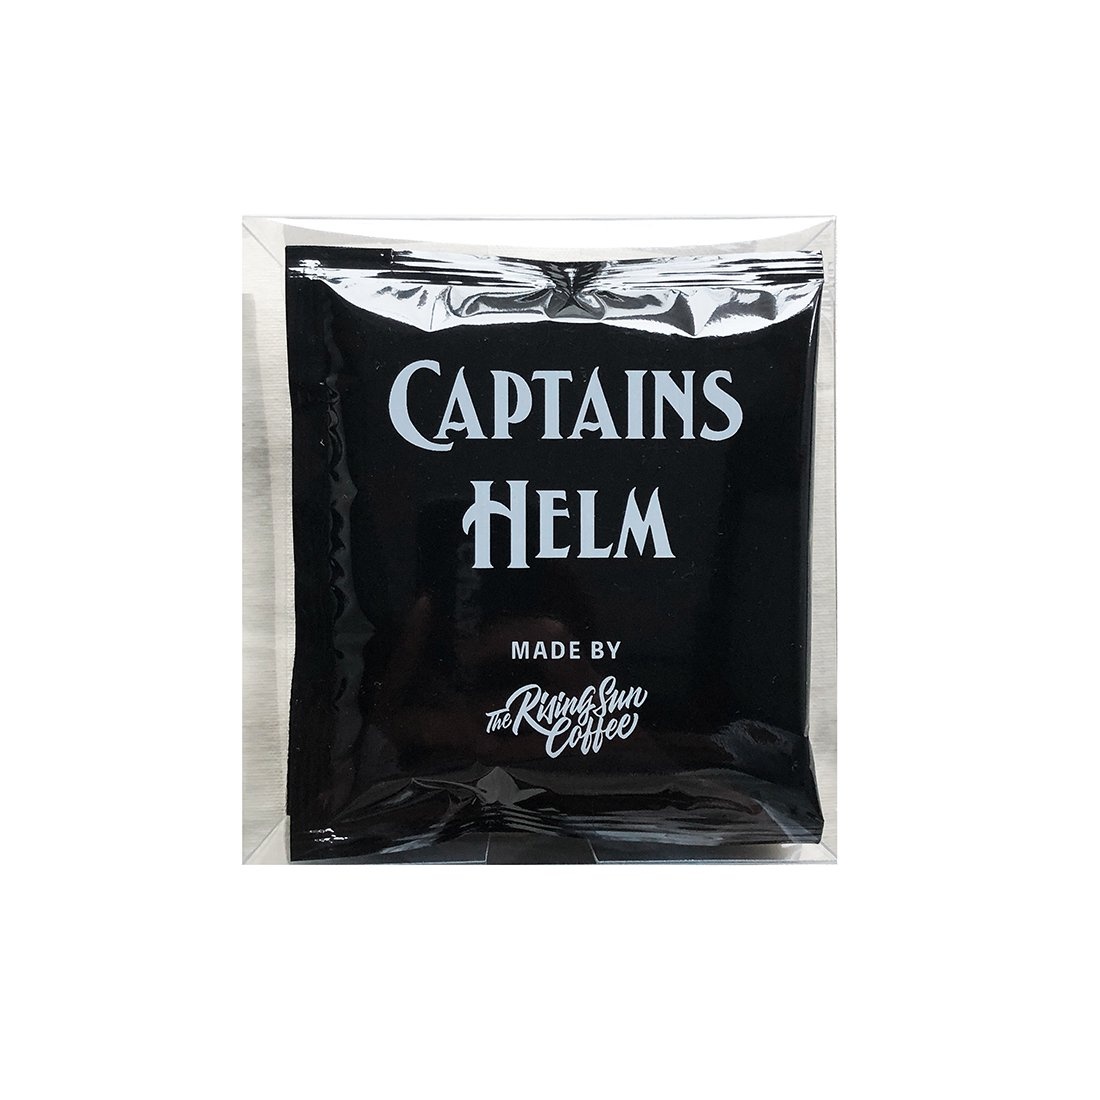 THE RISING SUN COFFEE × CAPTAINS HELM    #ORIGINAL DRIP PACK -HELMS BLEND-